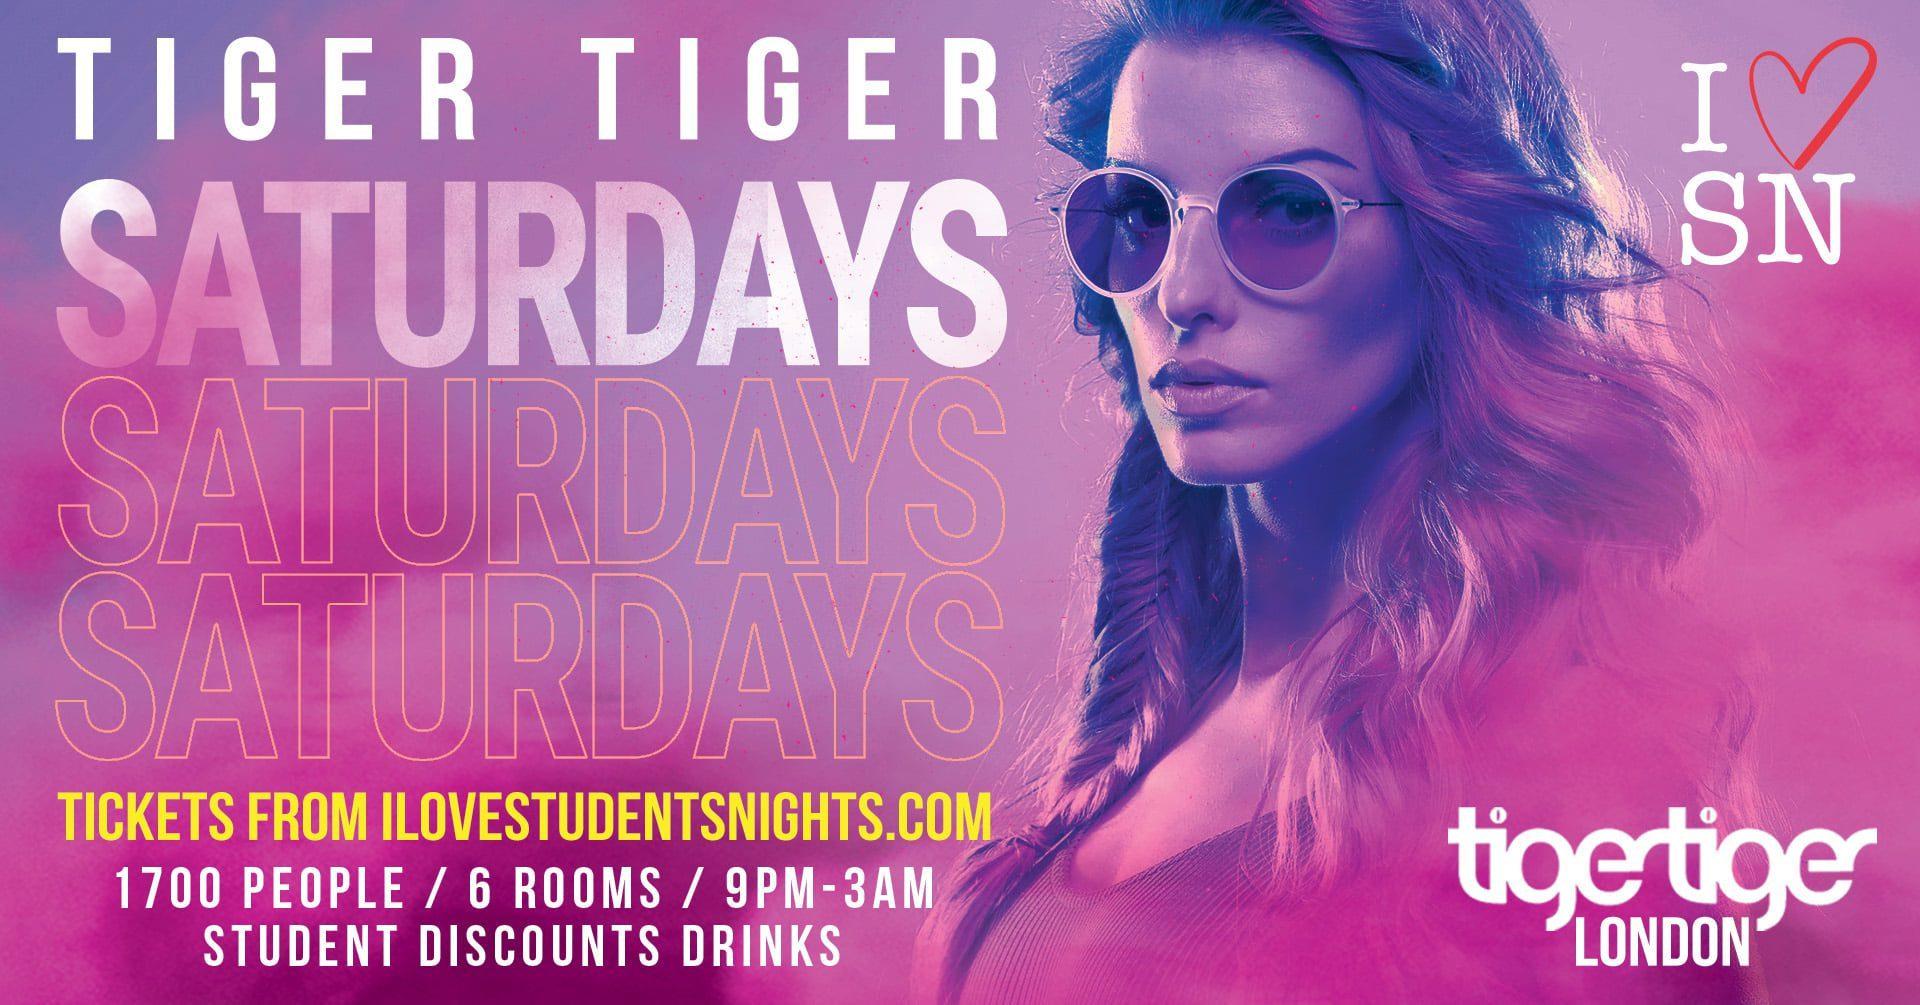 Tiger Tiger London every Saturday